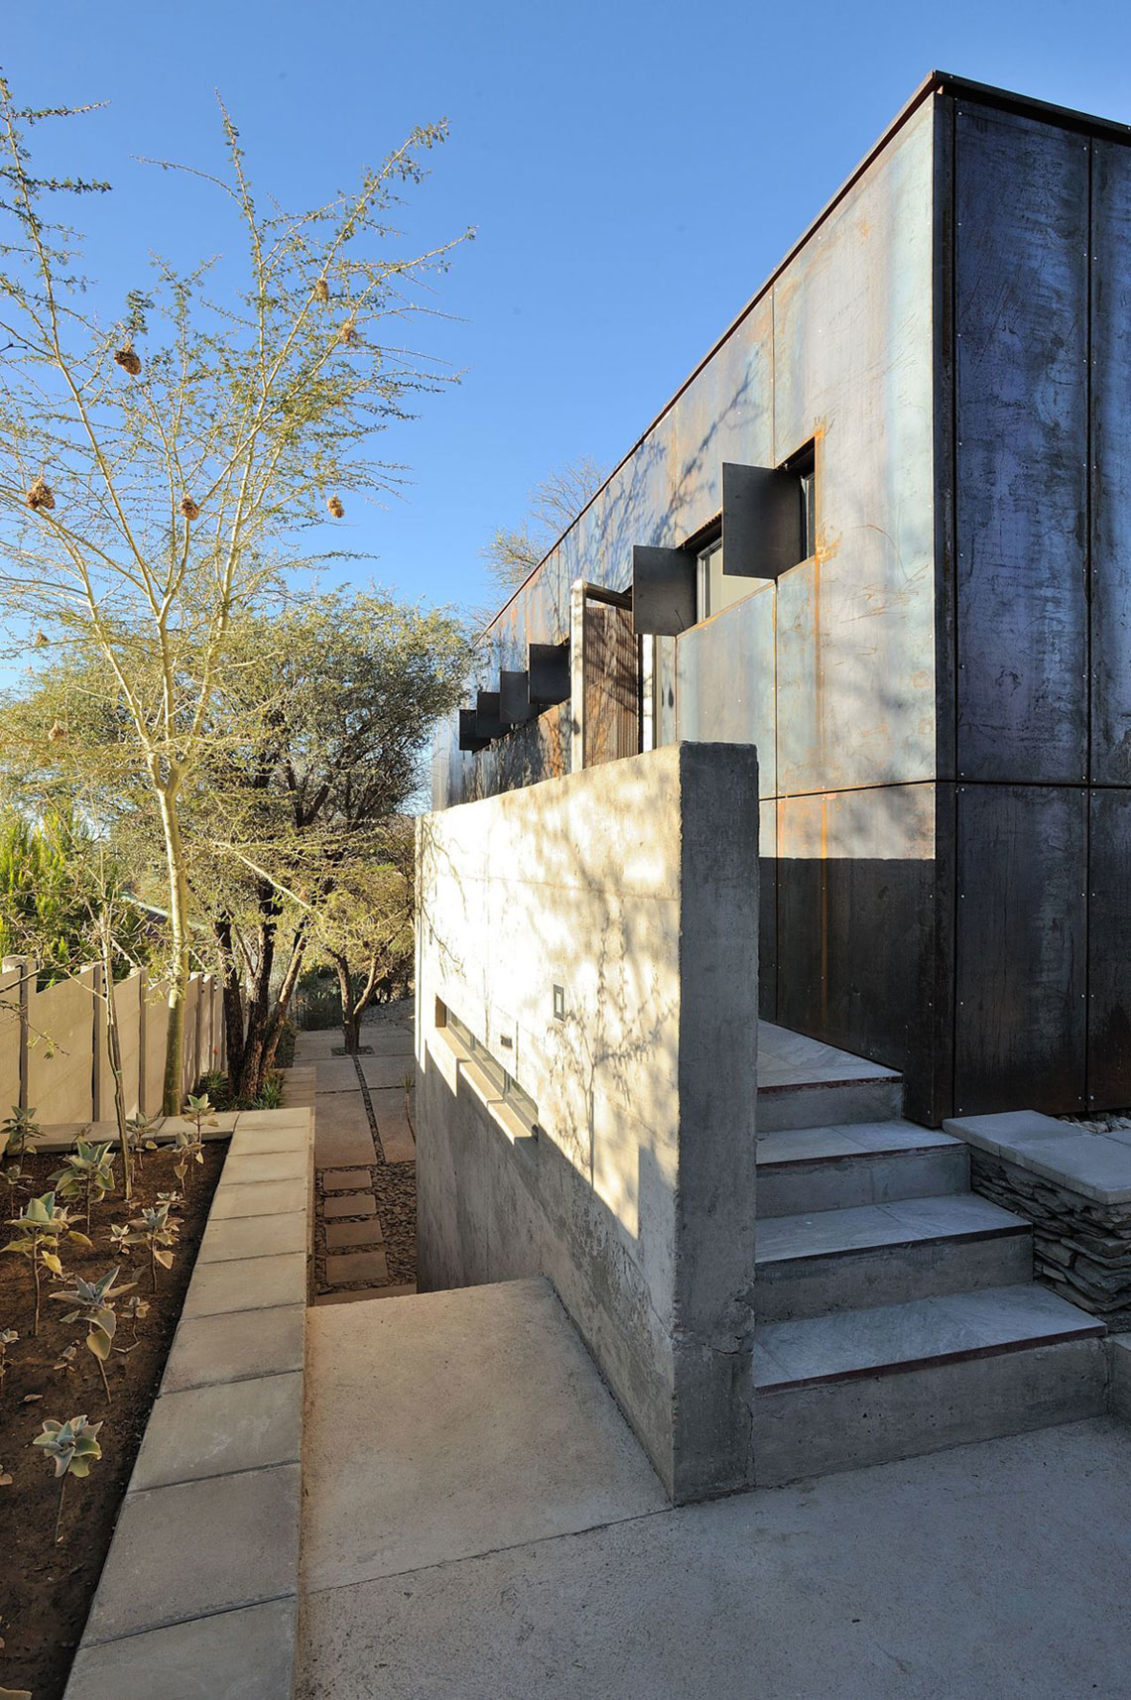 10 Ossmann Street by Wasserfall Munting Architects (4)